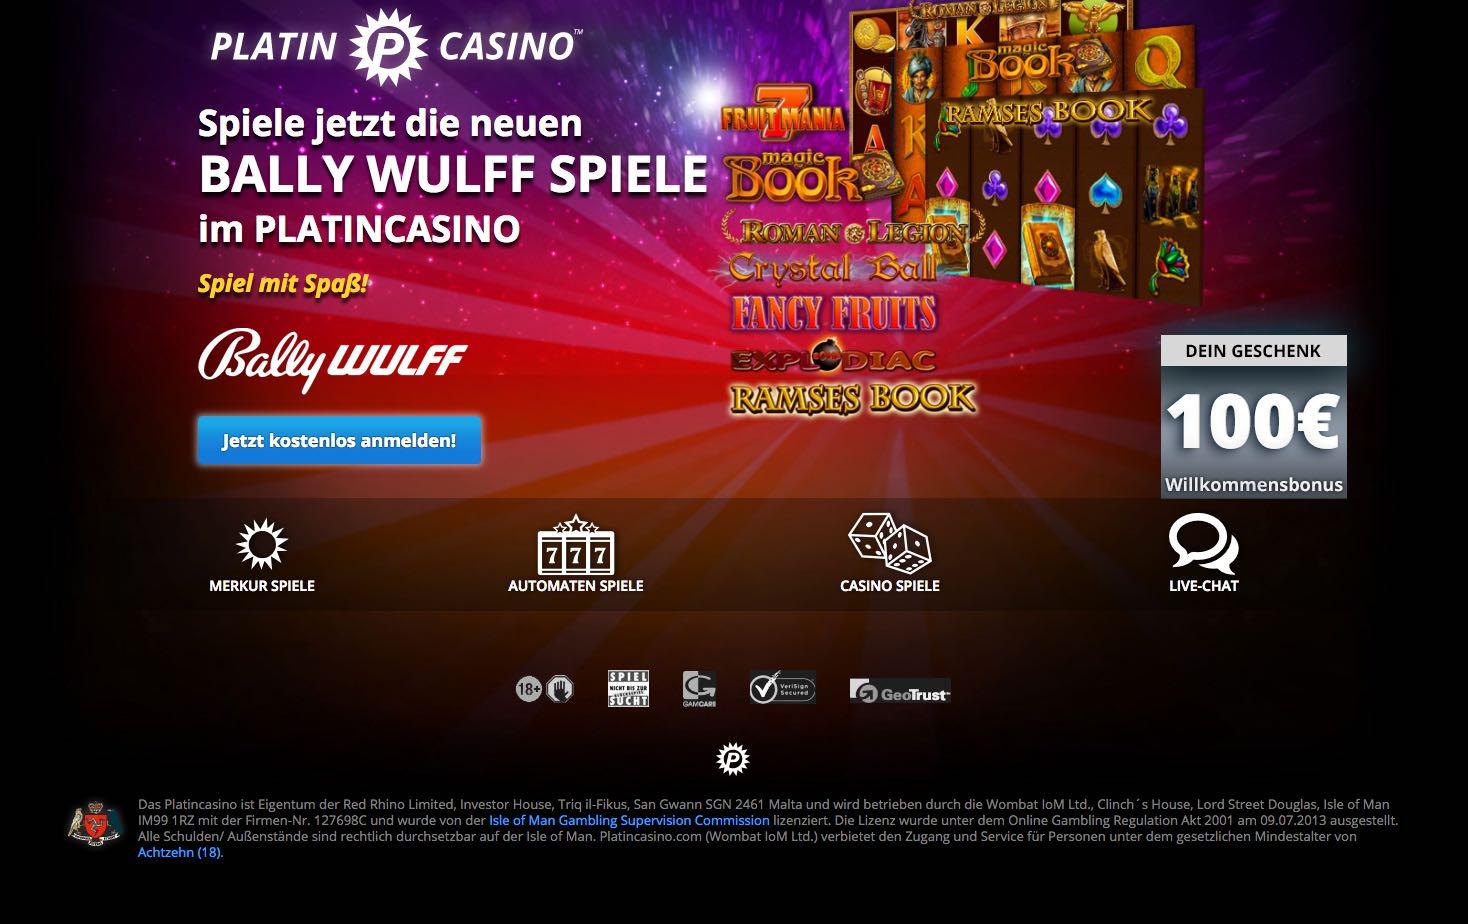 Progressions Casino gesucht 627699